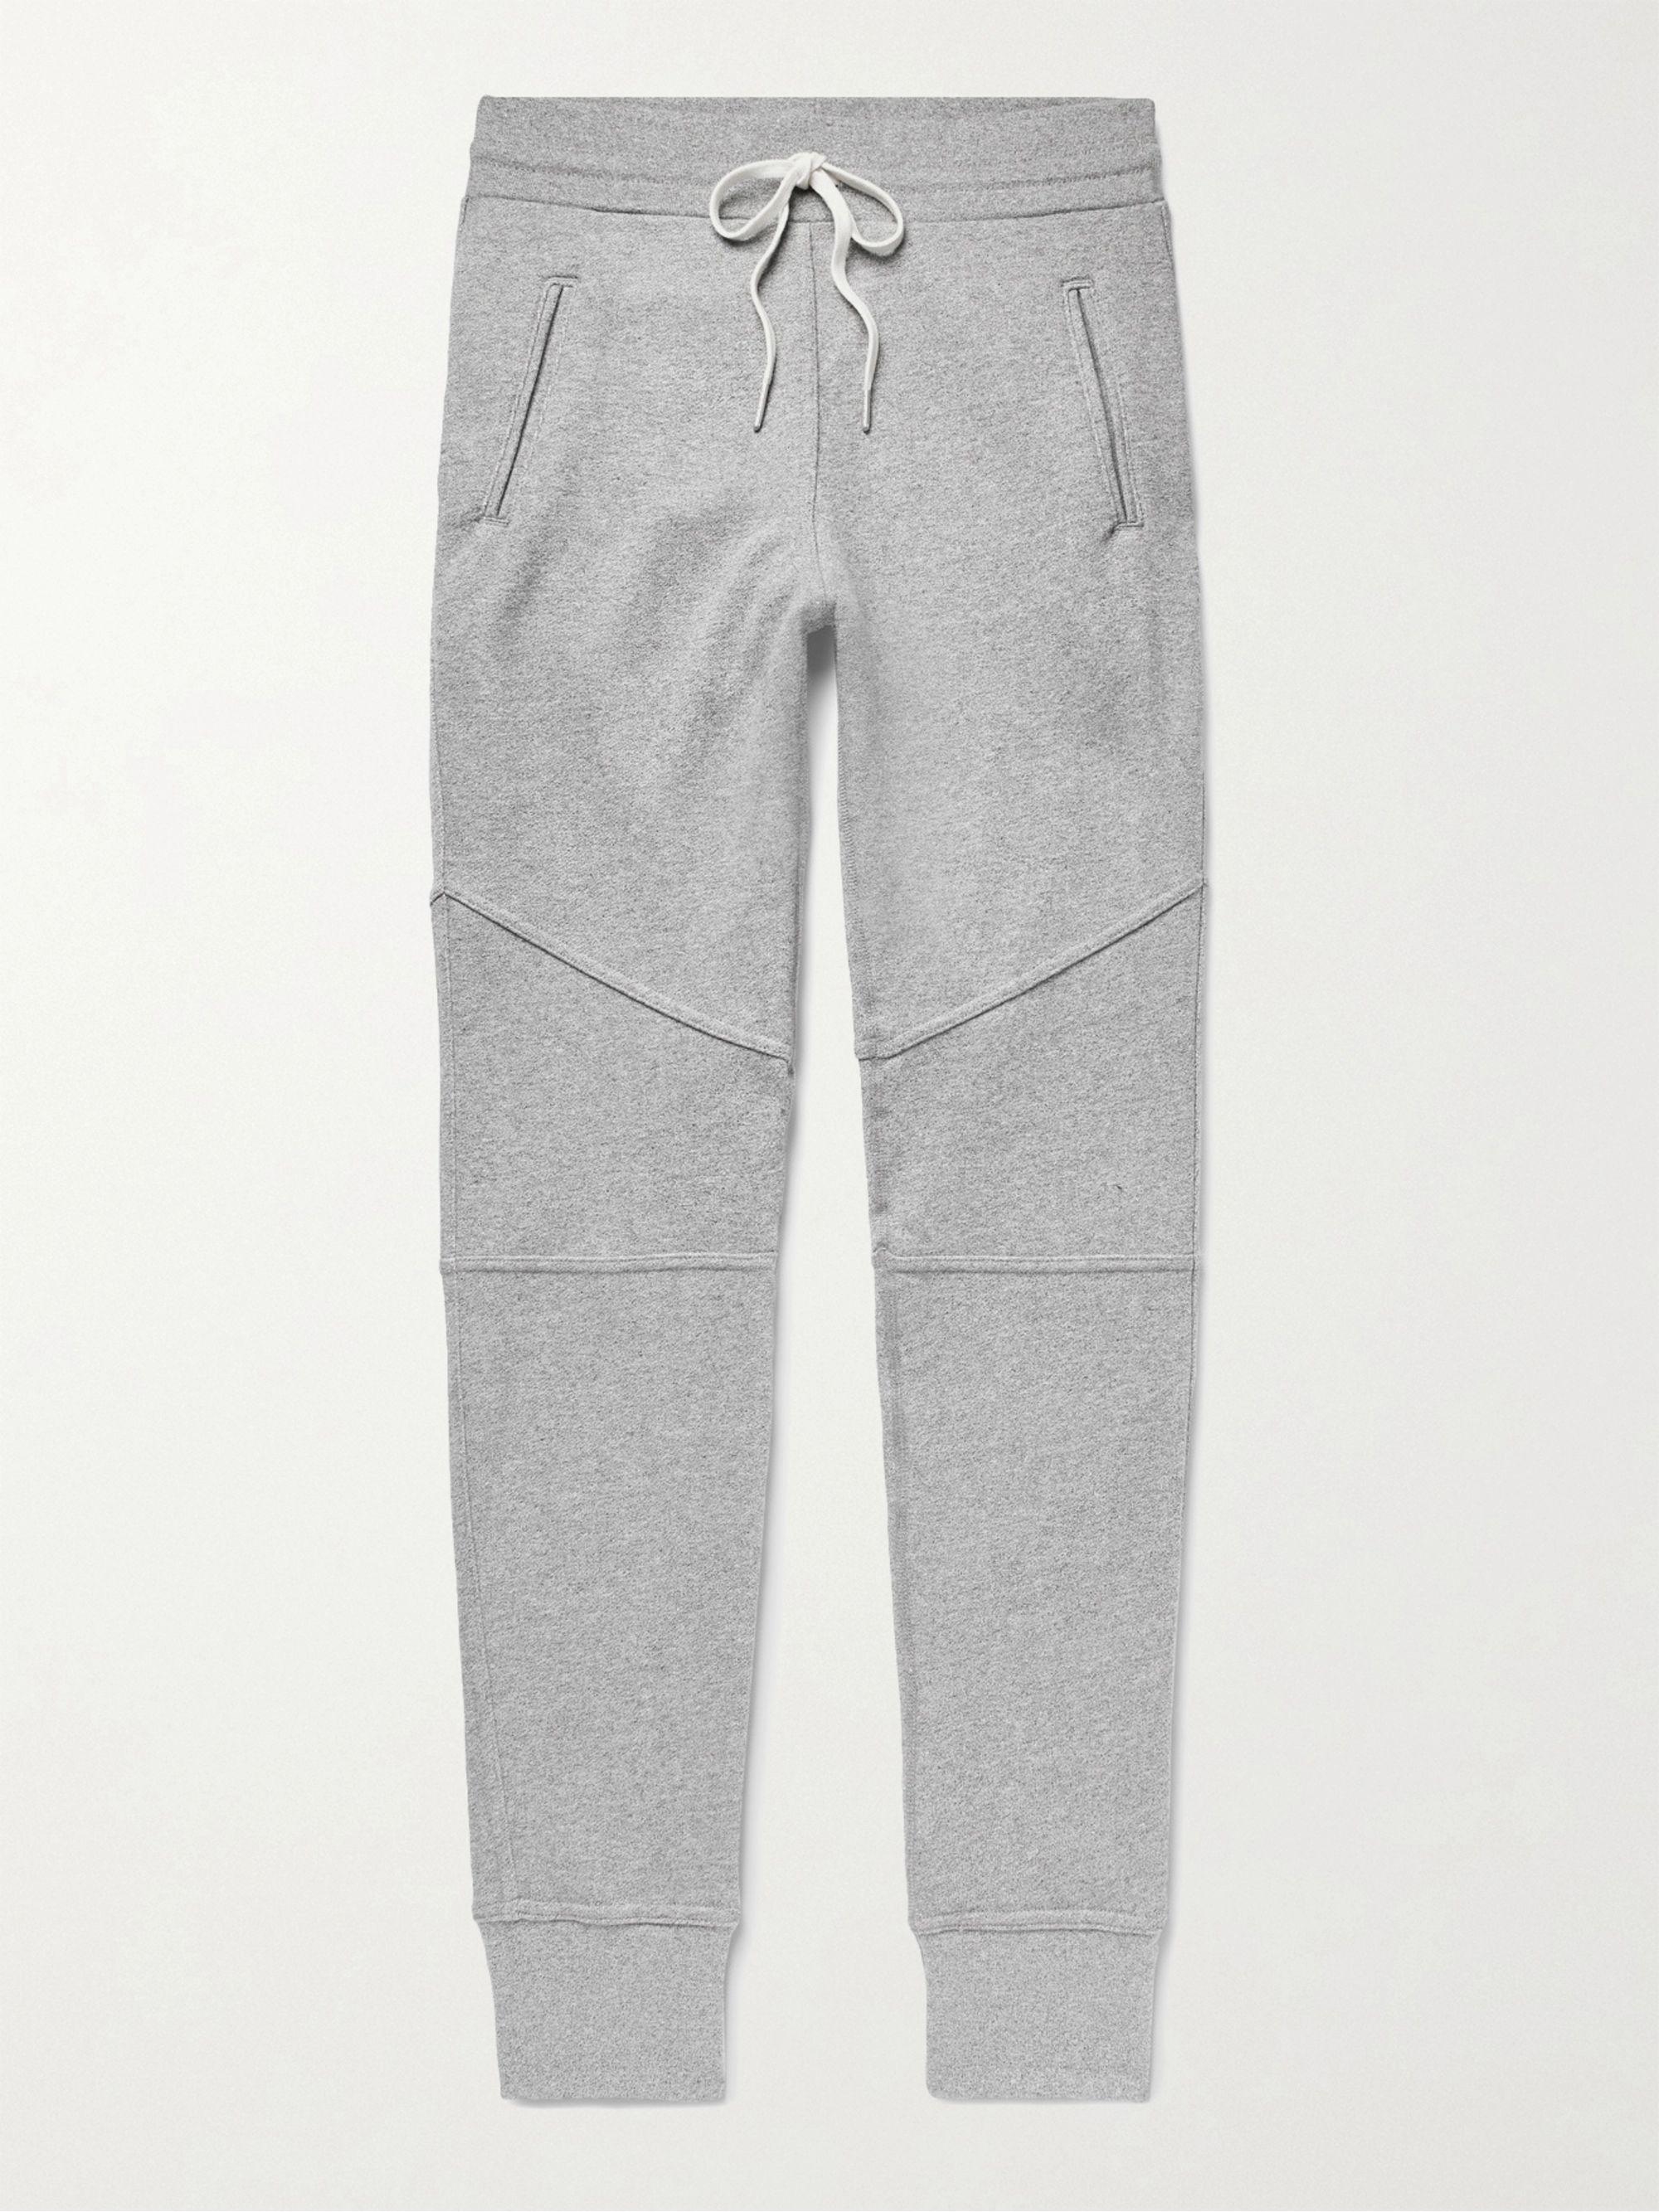 John Elliott Dark gray Escobar Slim-Fit Tapered Loopback Cotton-Blend Jersey Sweatpants,Dark gray